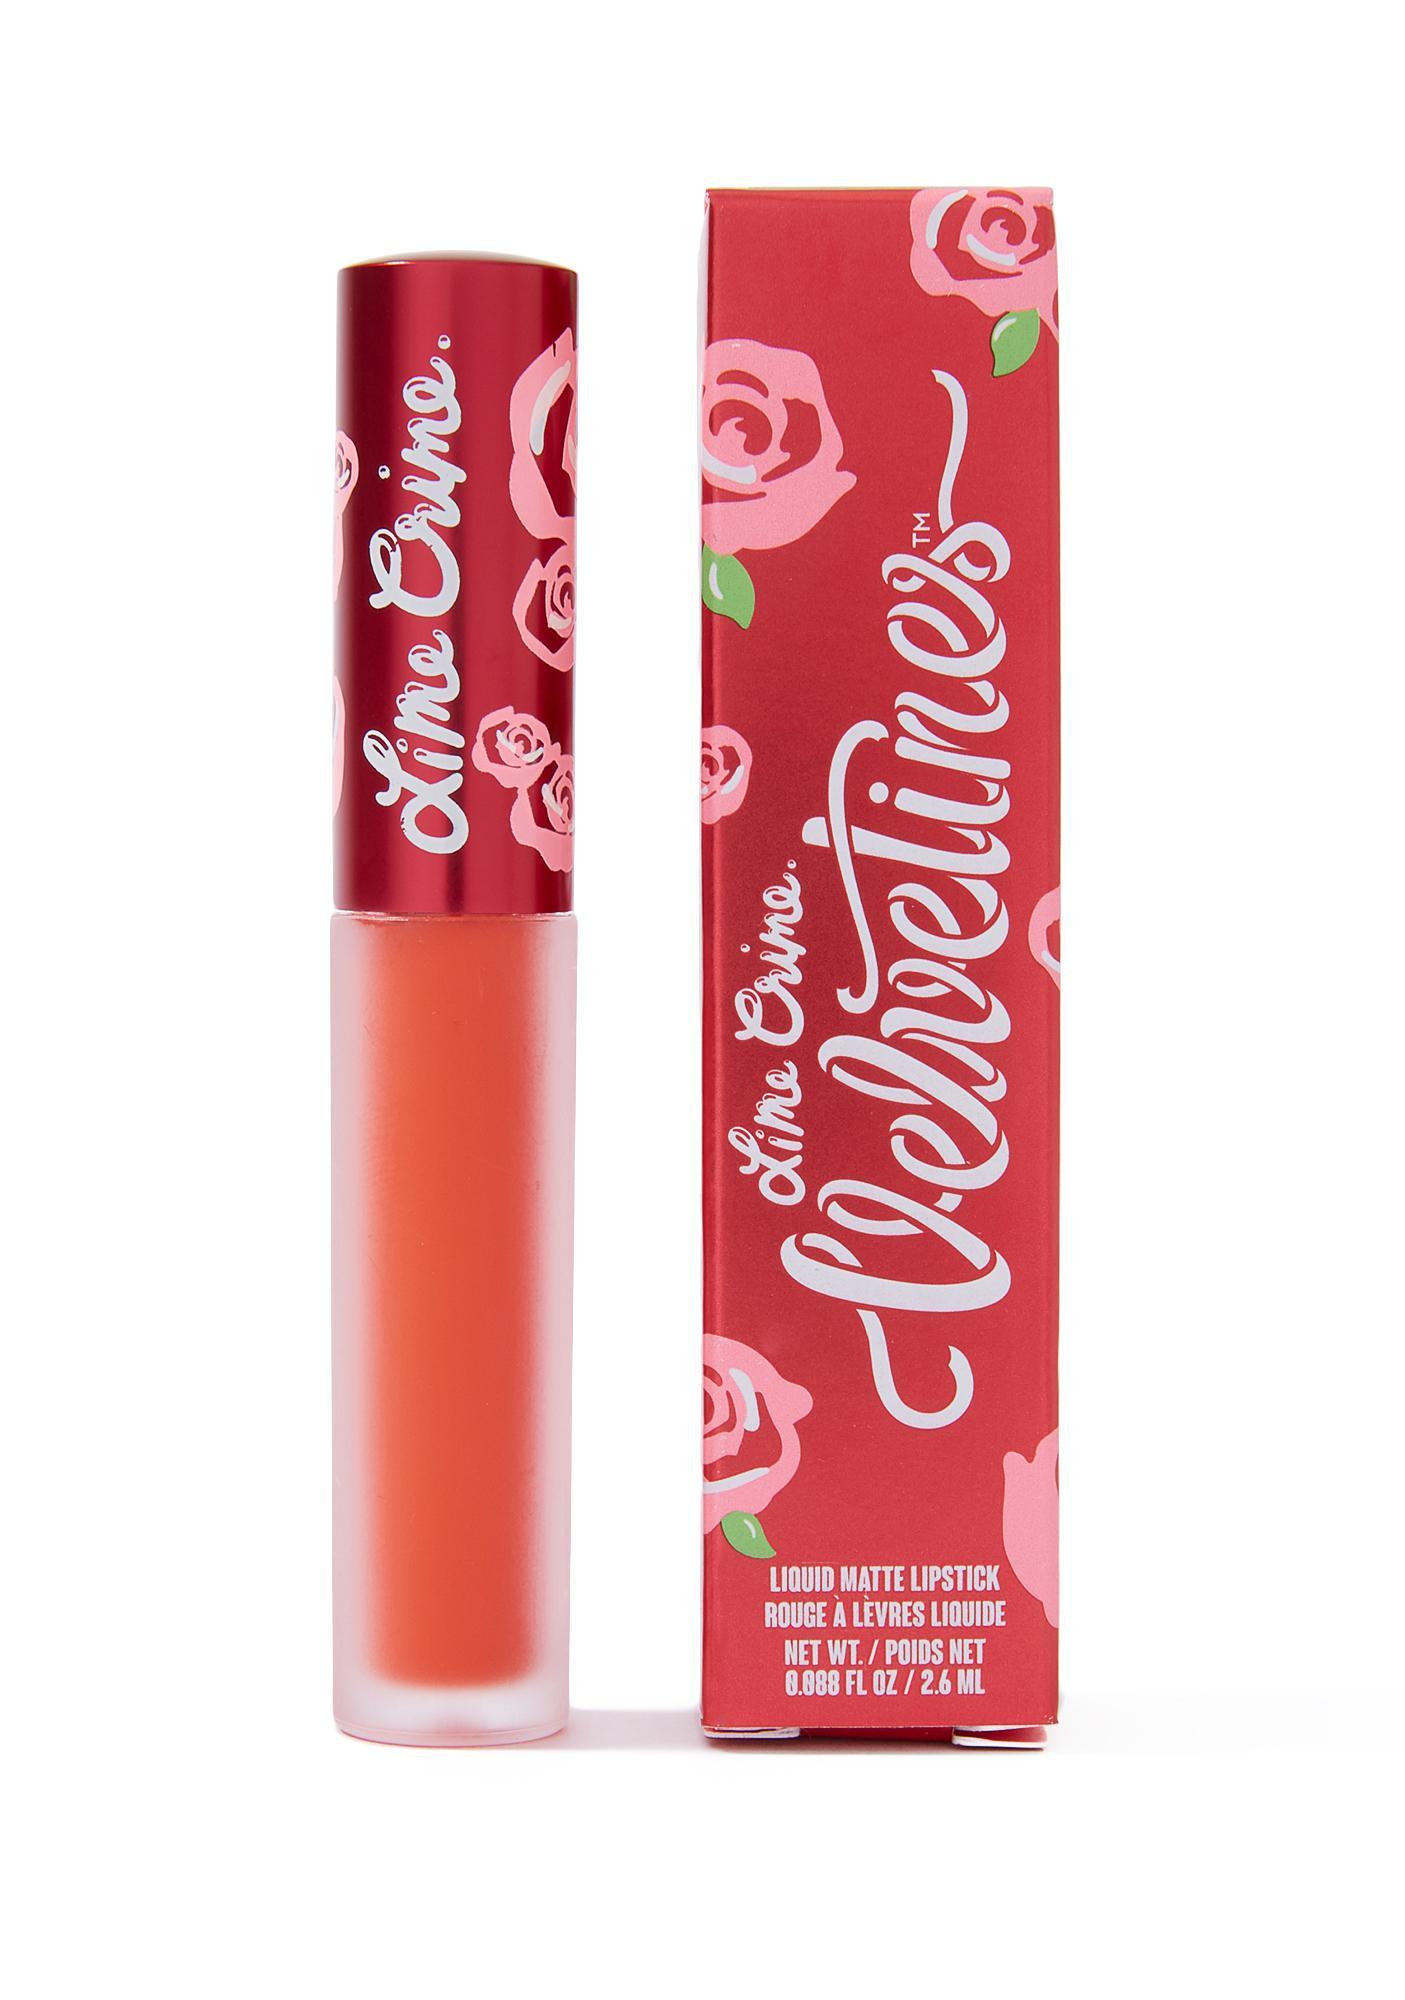 Lime Crime Psycho Velvetine Liquid Lipstick